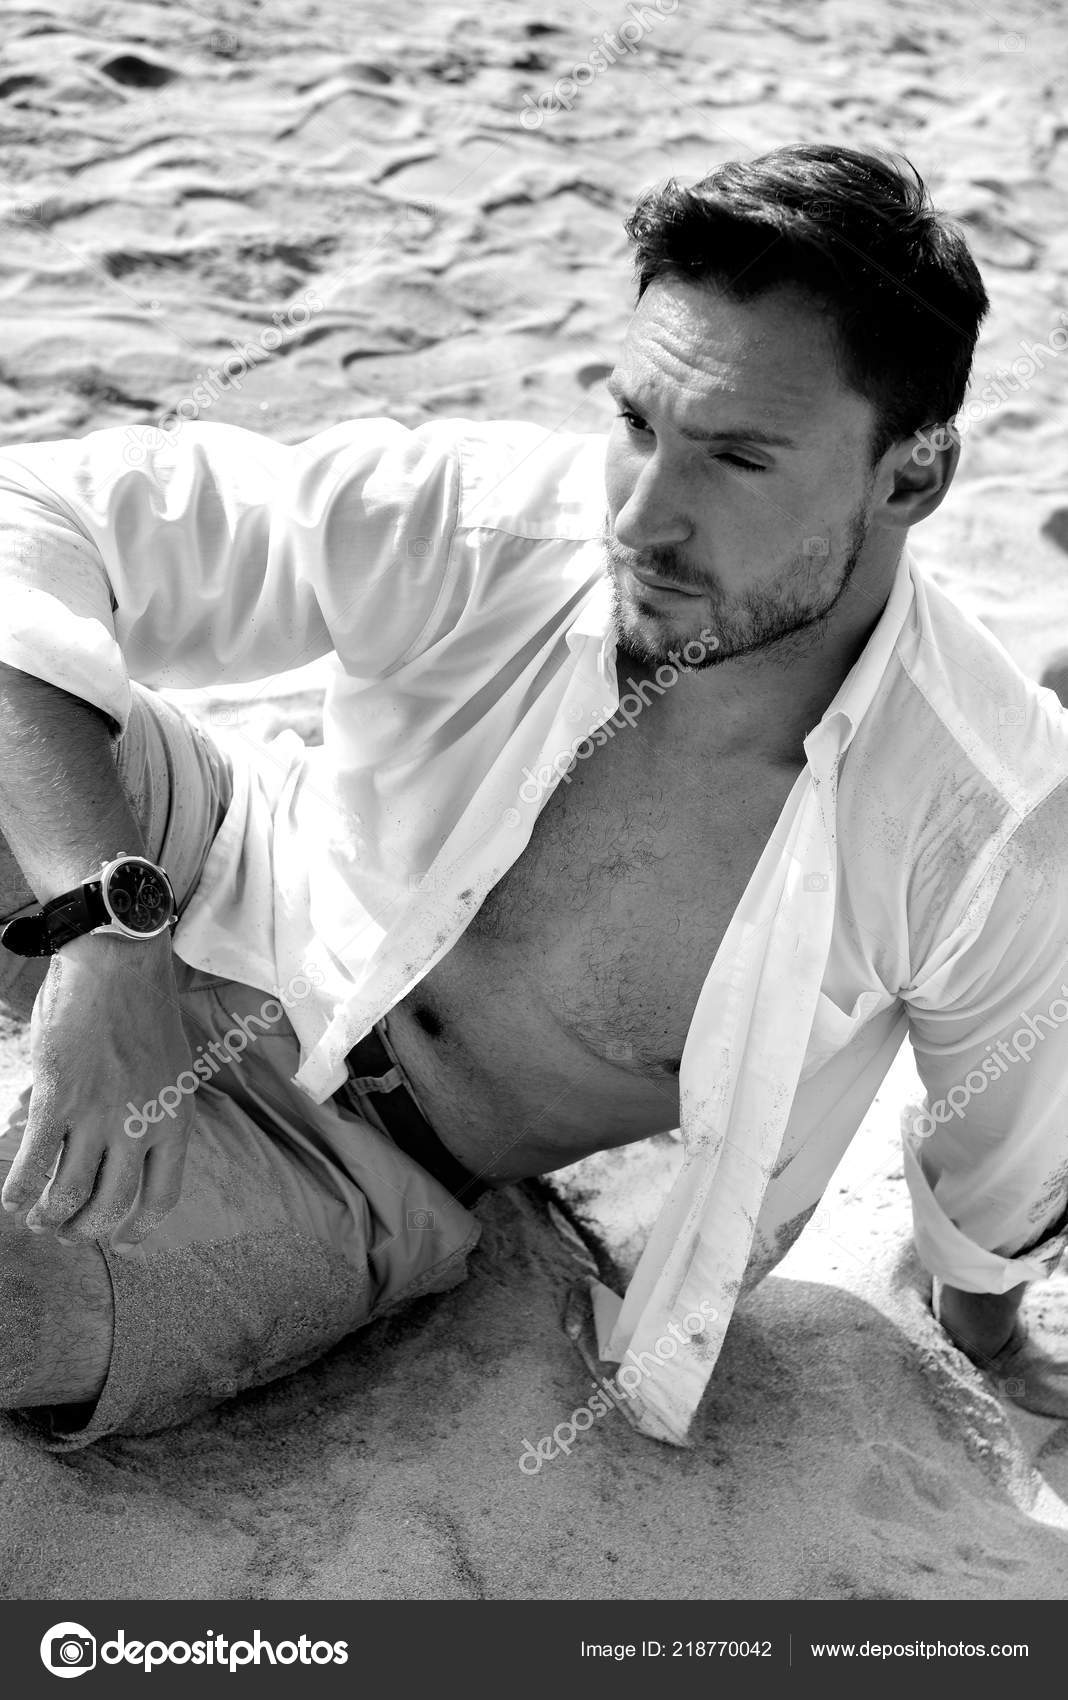 Nagie modele na plaży